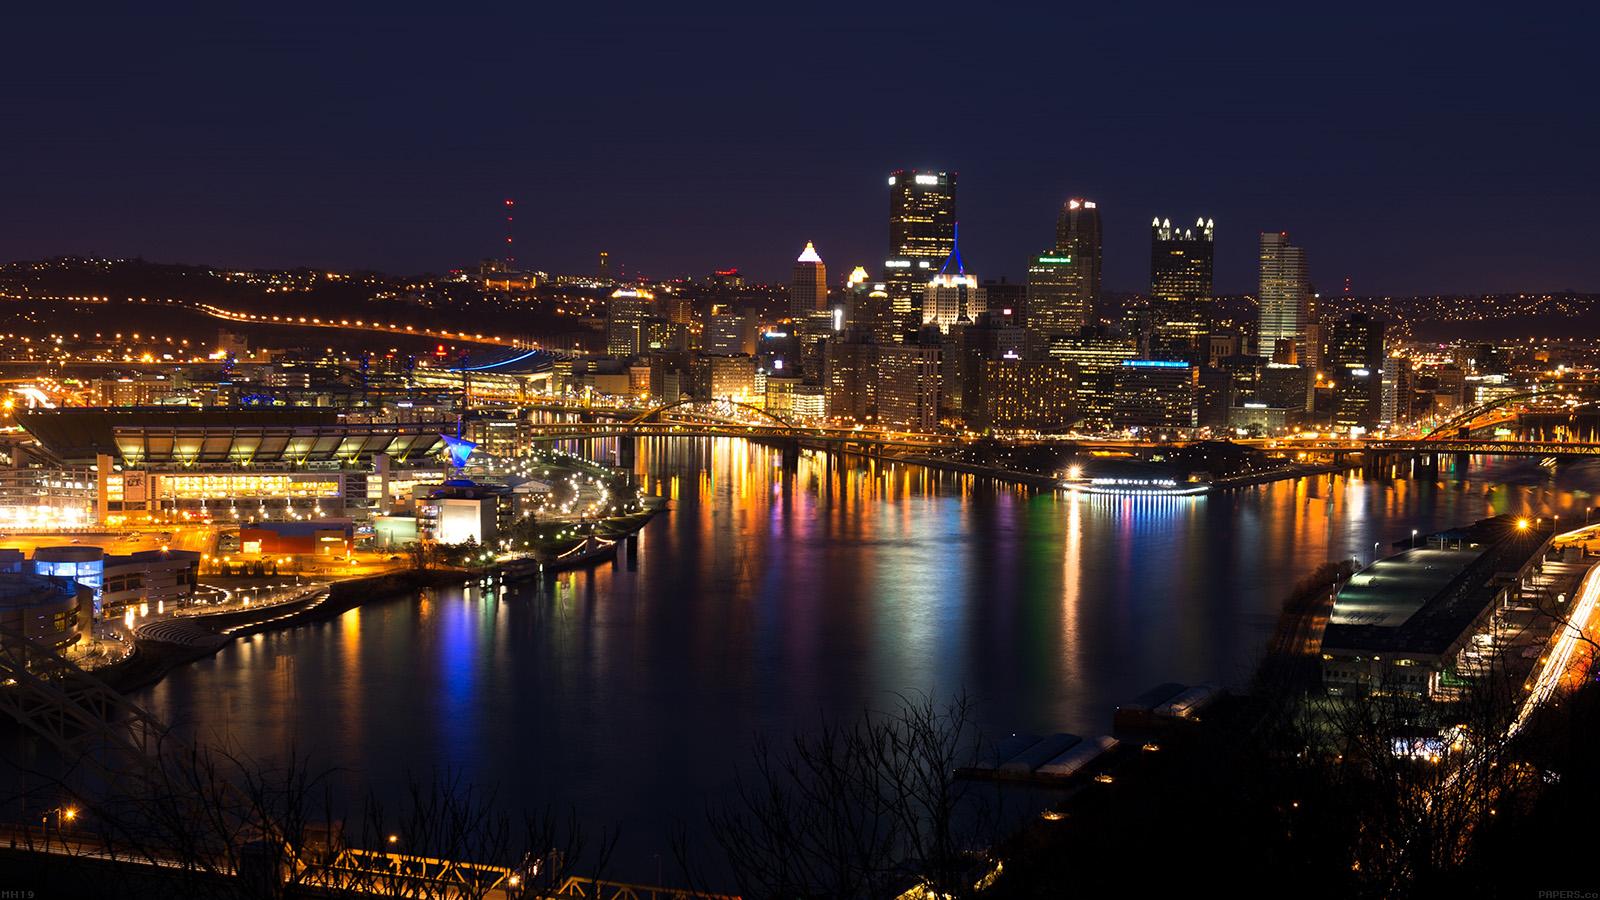 Pittsburgh Desktop Wallpaper Skyline: Wallpaper For Desktop, Laptop